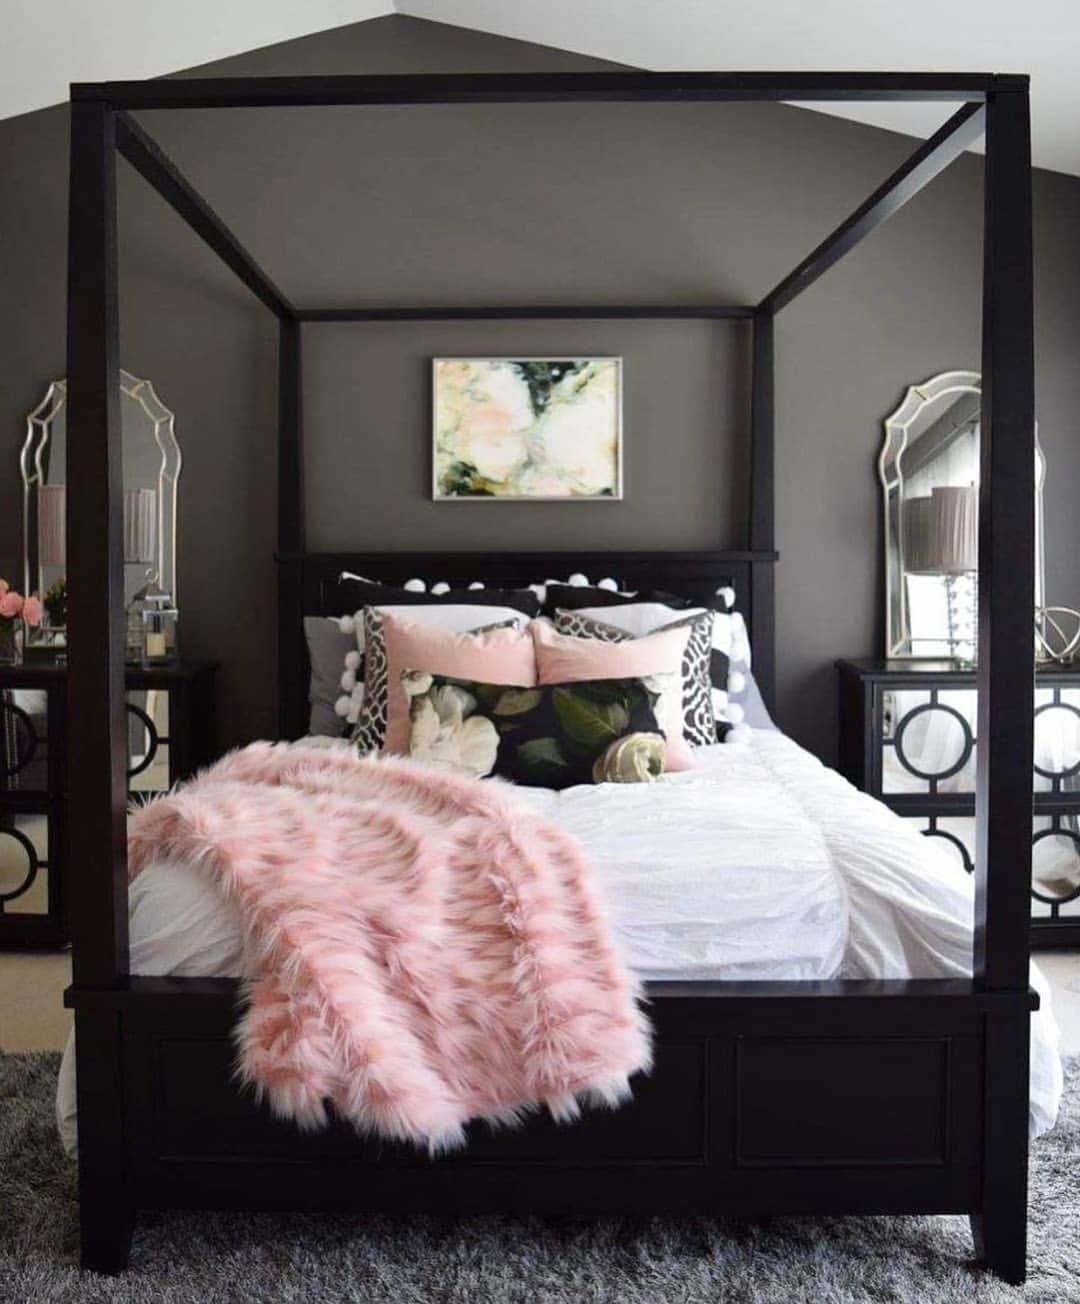 Parents, Stop Decorating Your Kid's Freshman Dorm